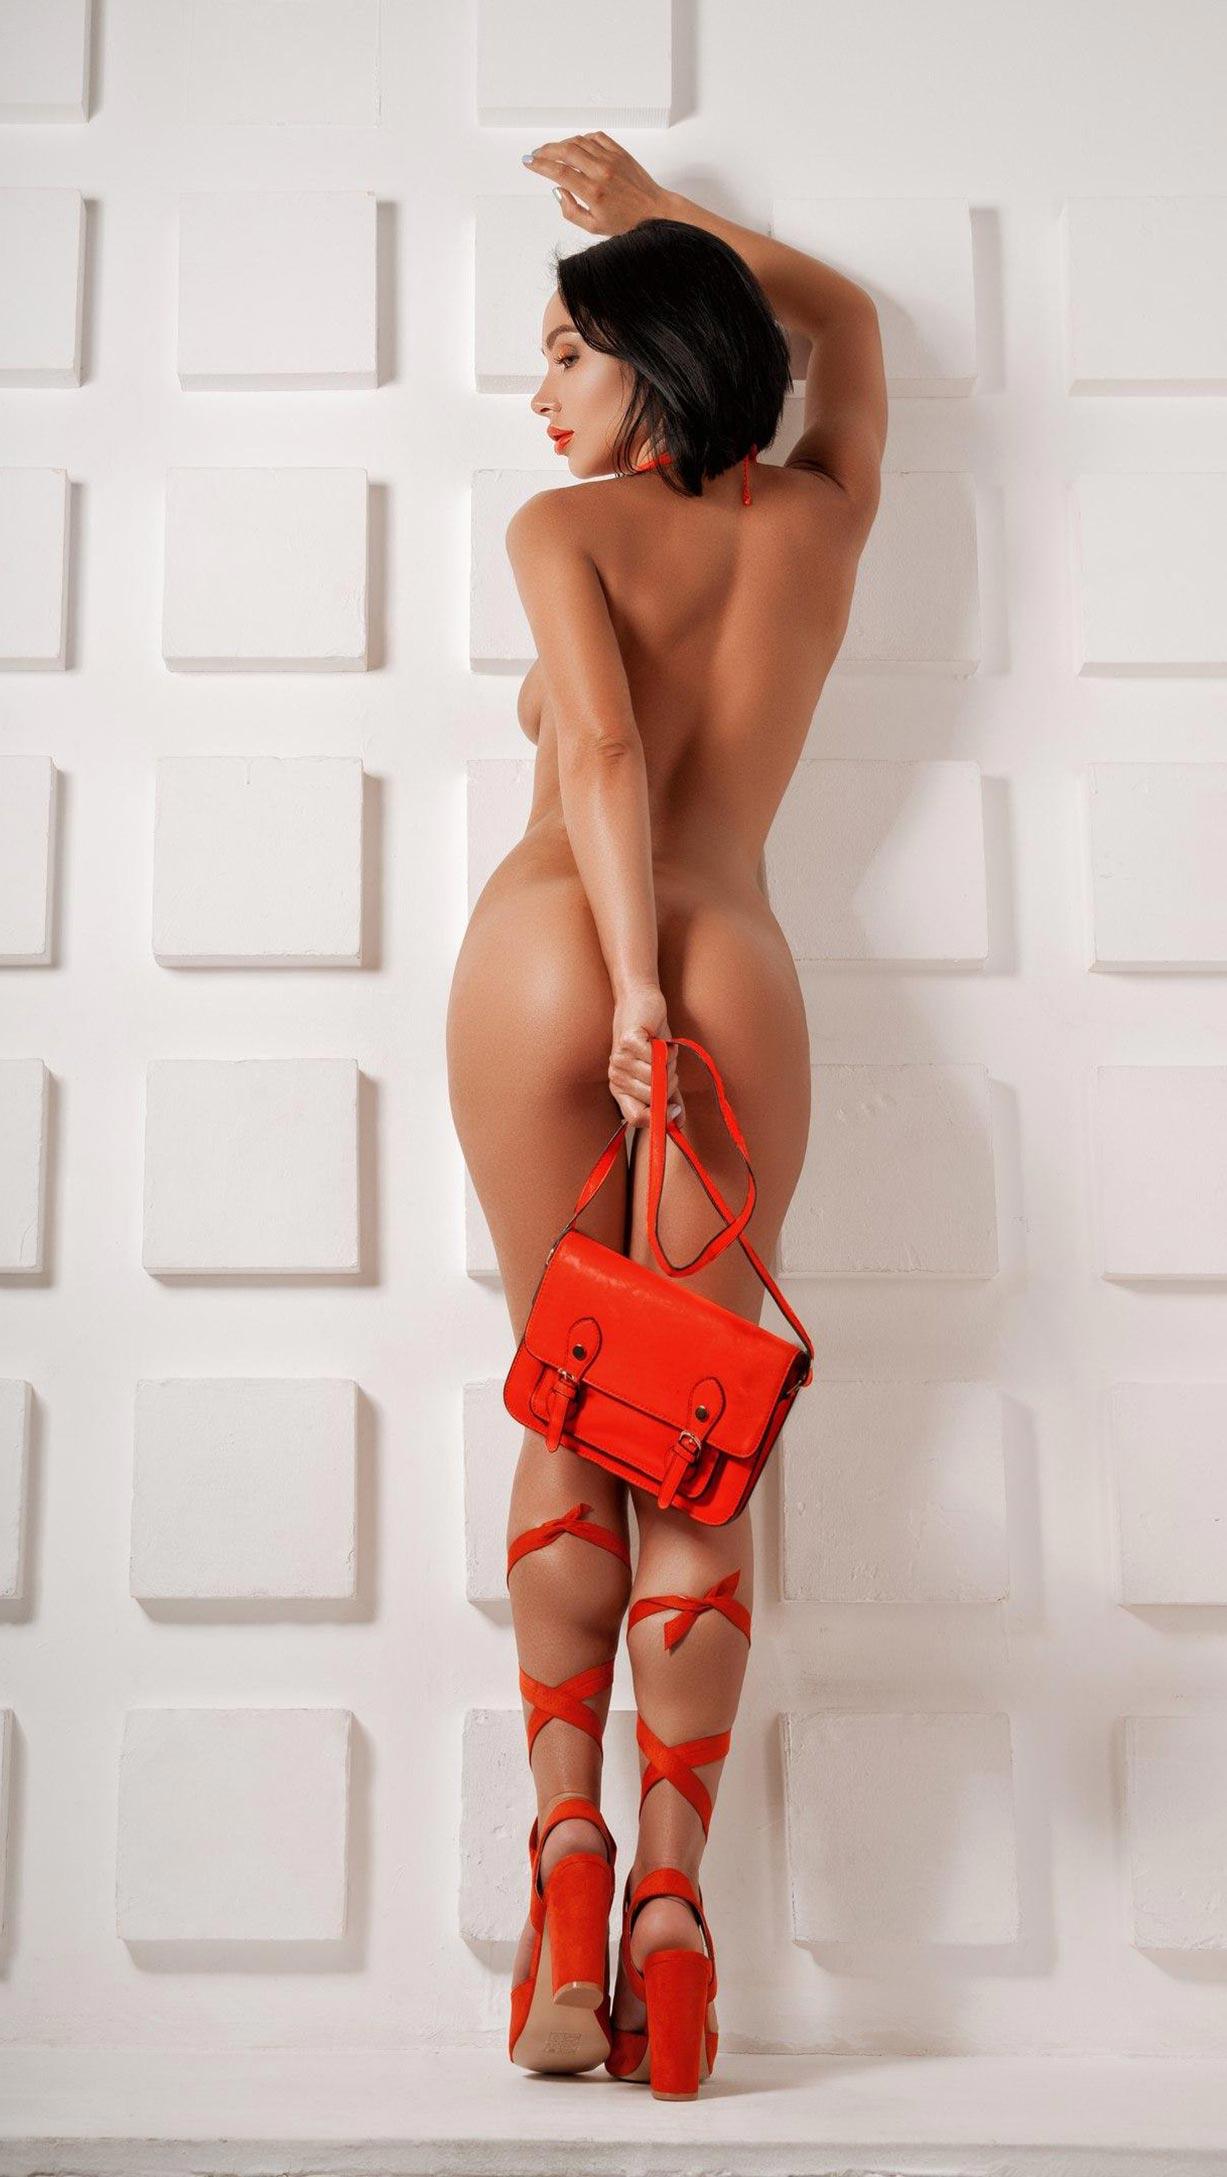 Олеся Левина и оранжевая мода / фото 04